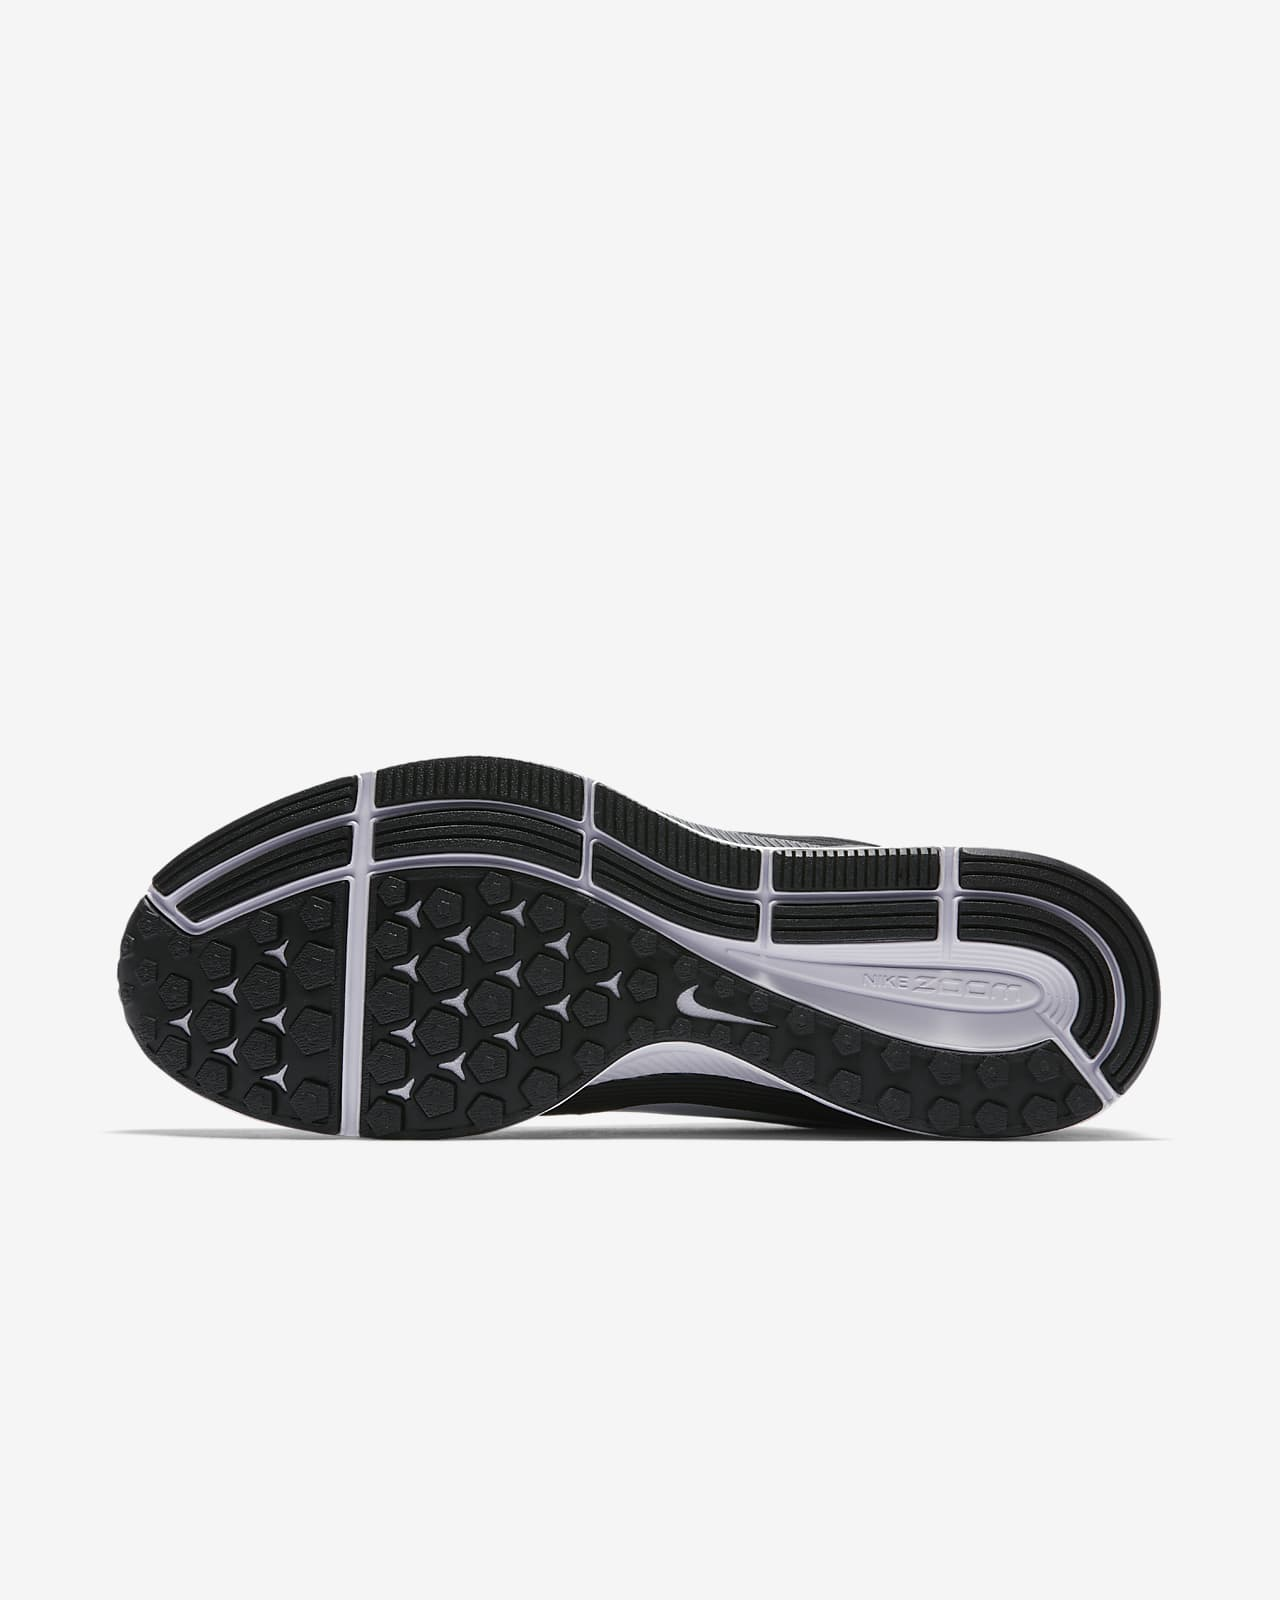 Calzado de running para hombre Nike Air Zoom Pegasus 34